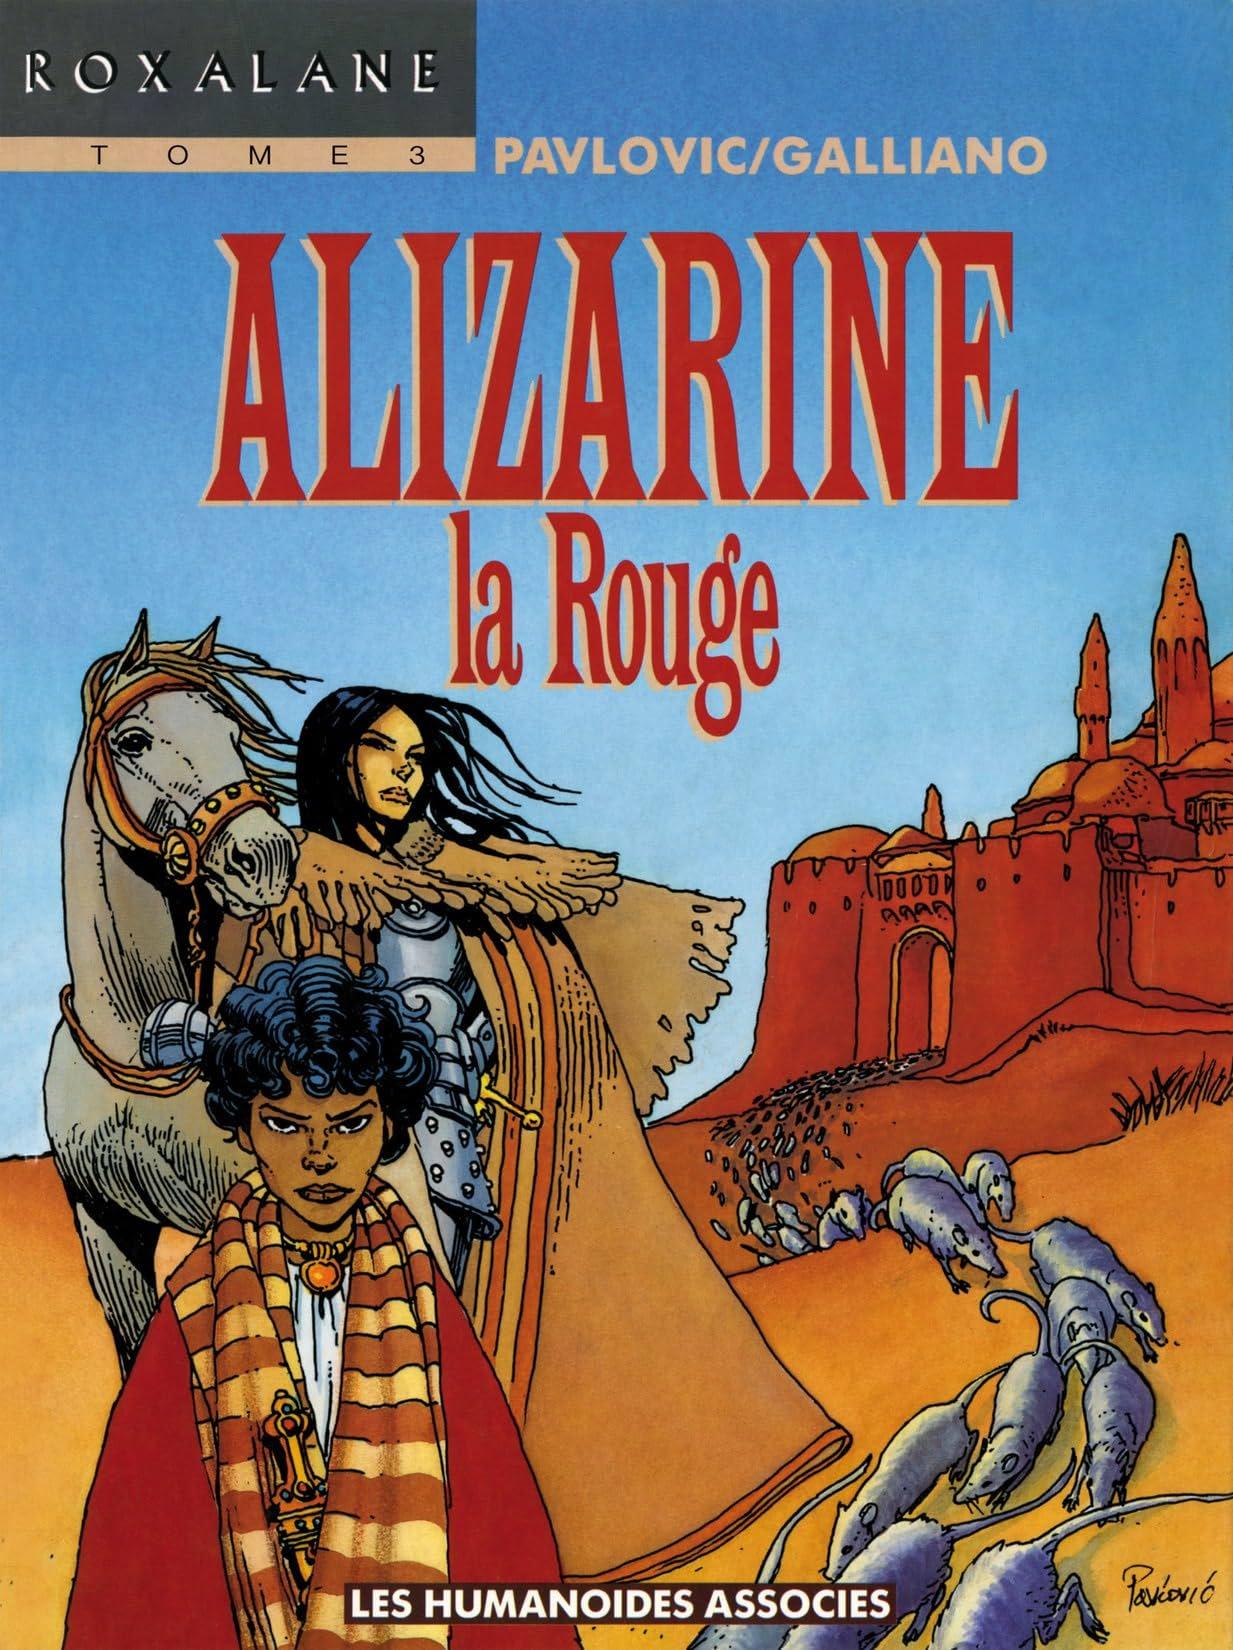 Roxalane Vol. 3: Alizarine la rouge